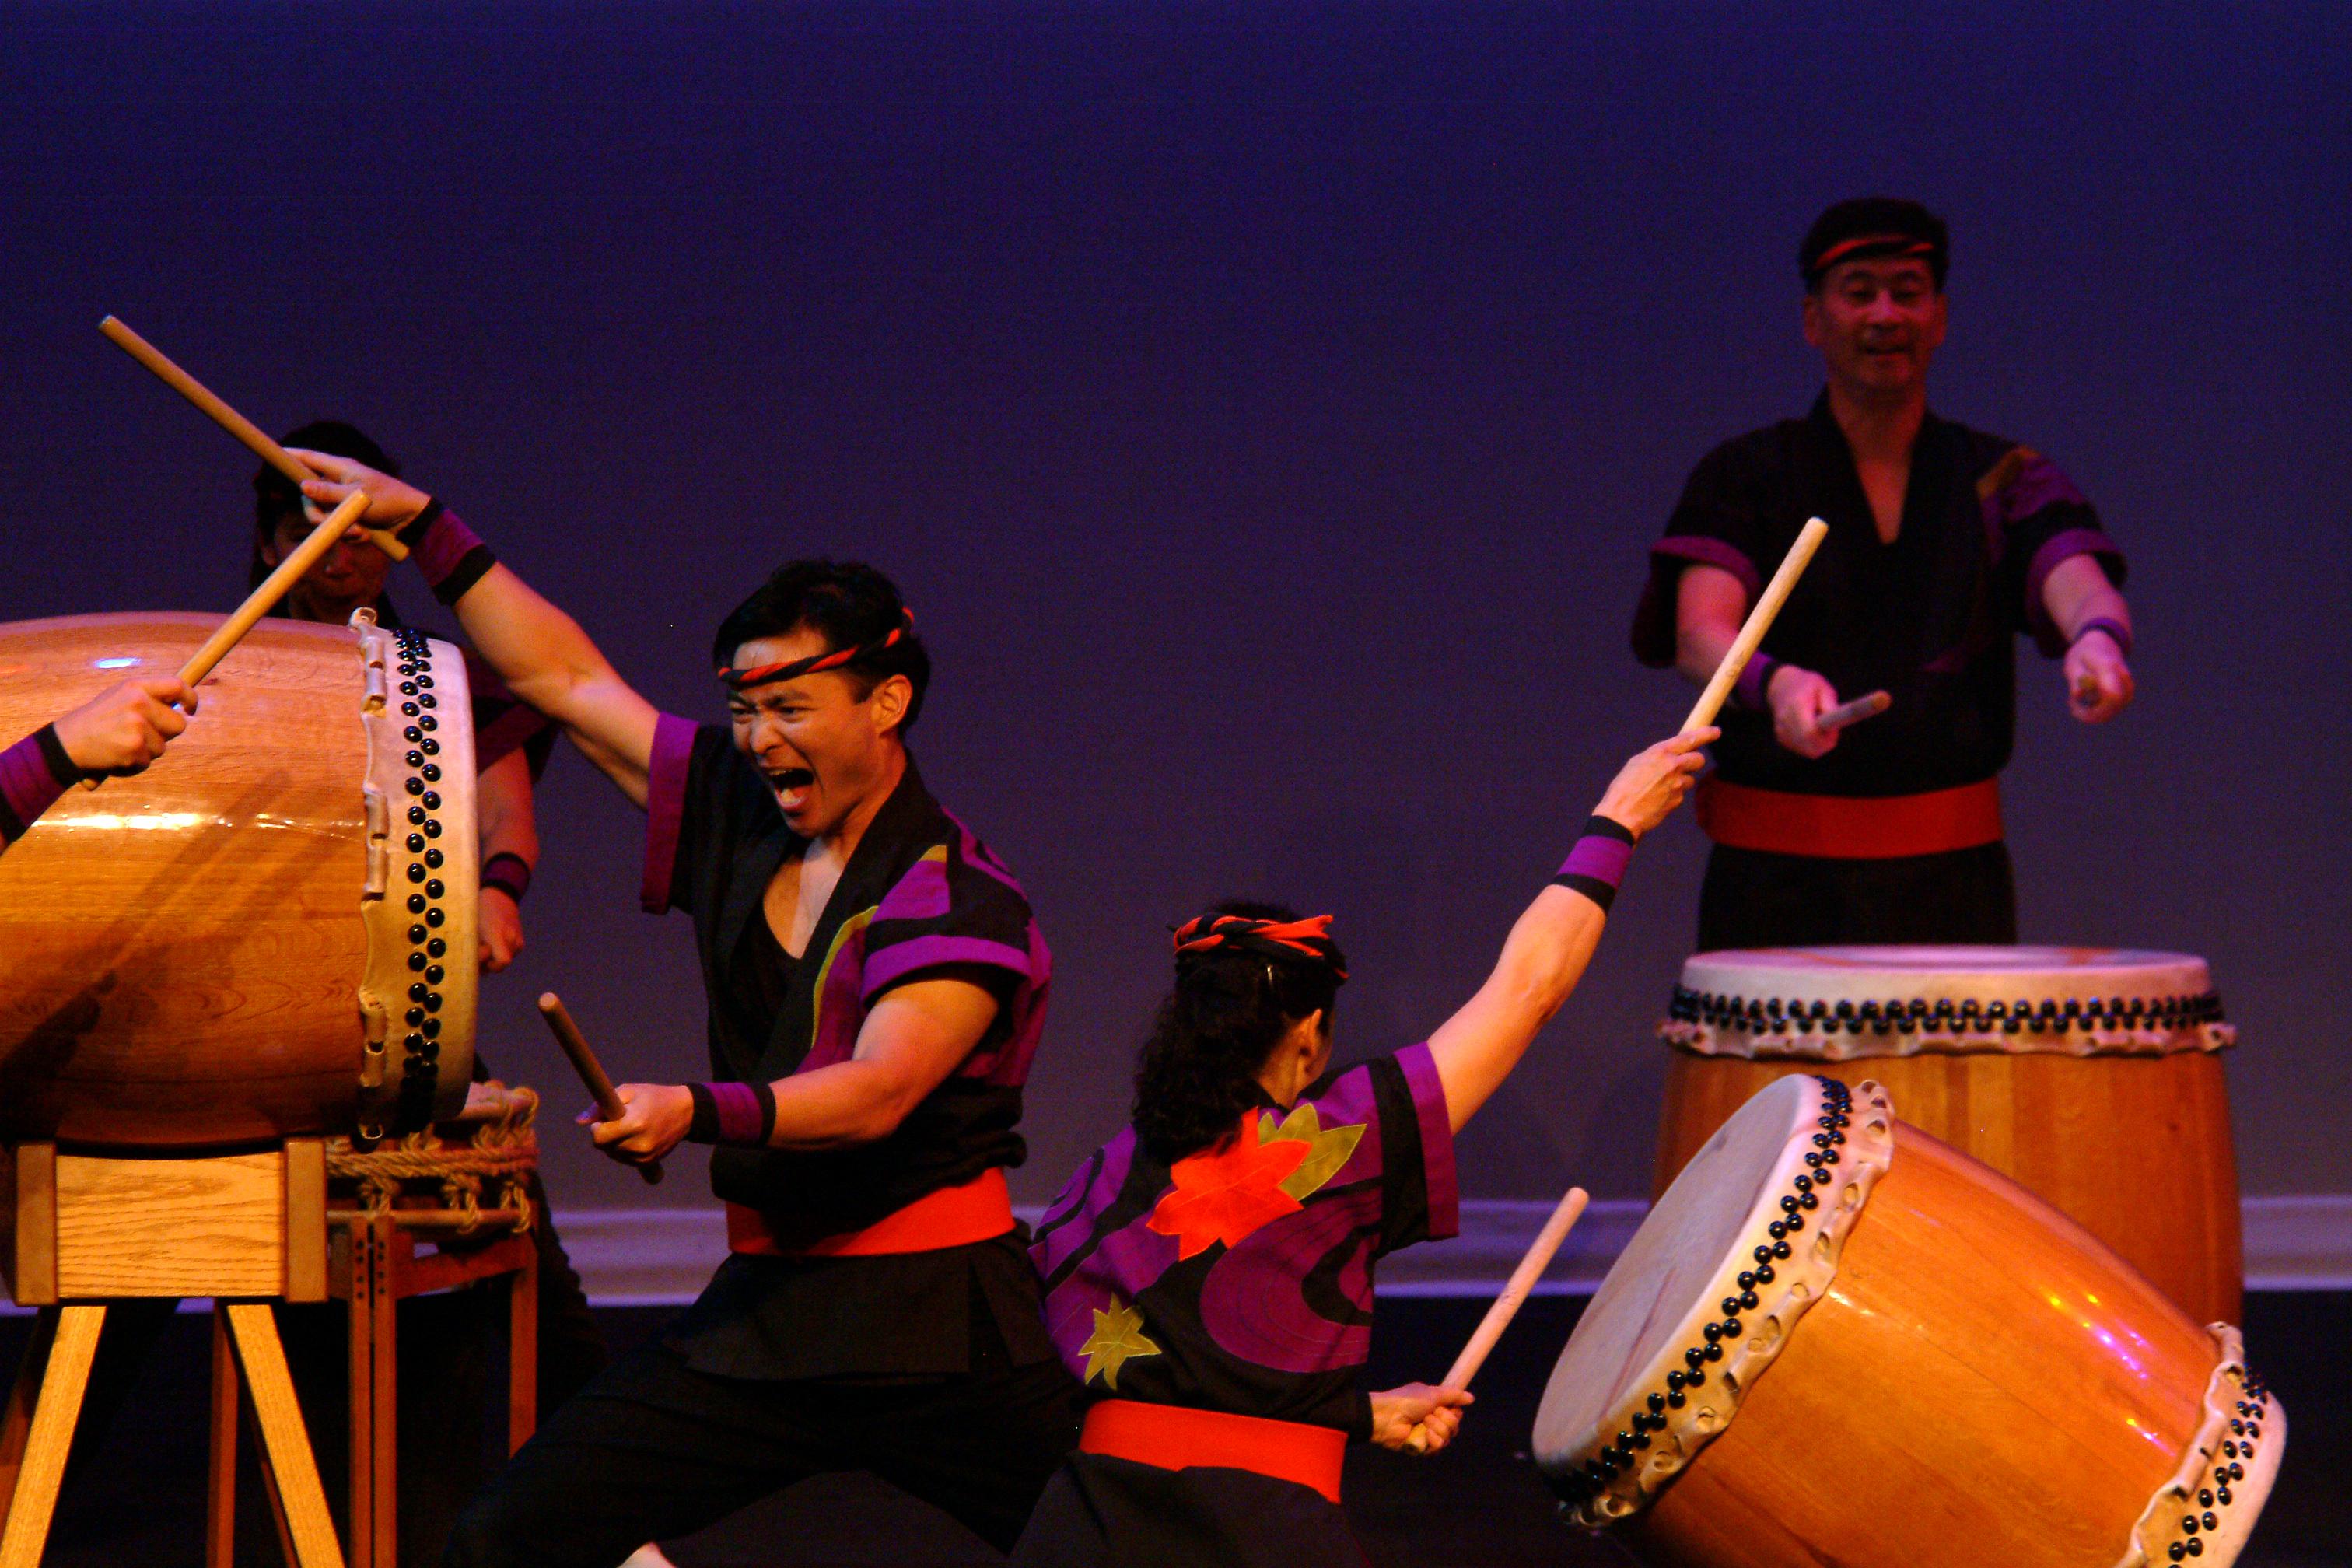 SVR: San Jose Taiko: Interactive Movement and Performance